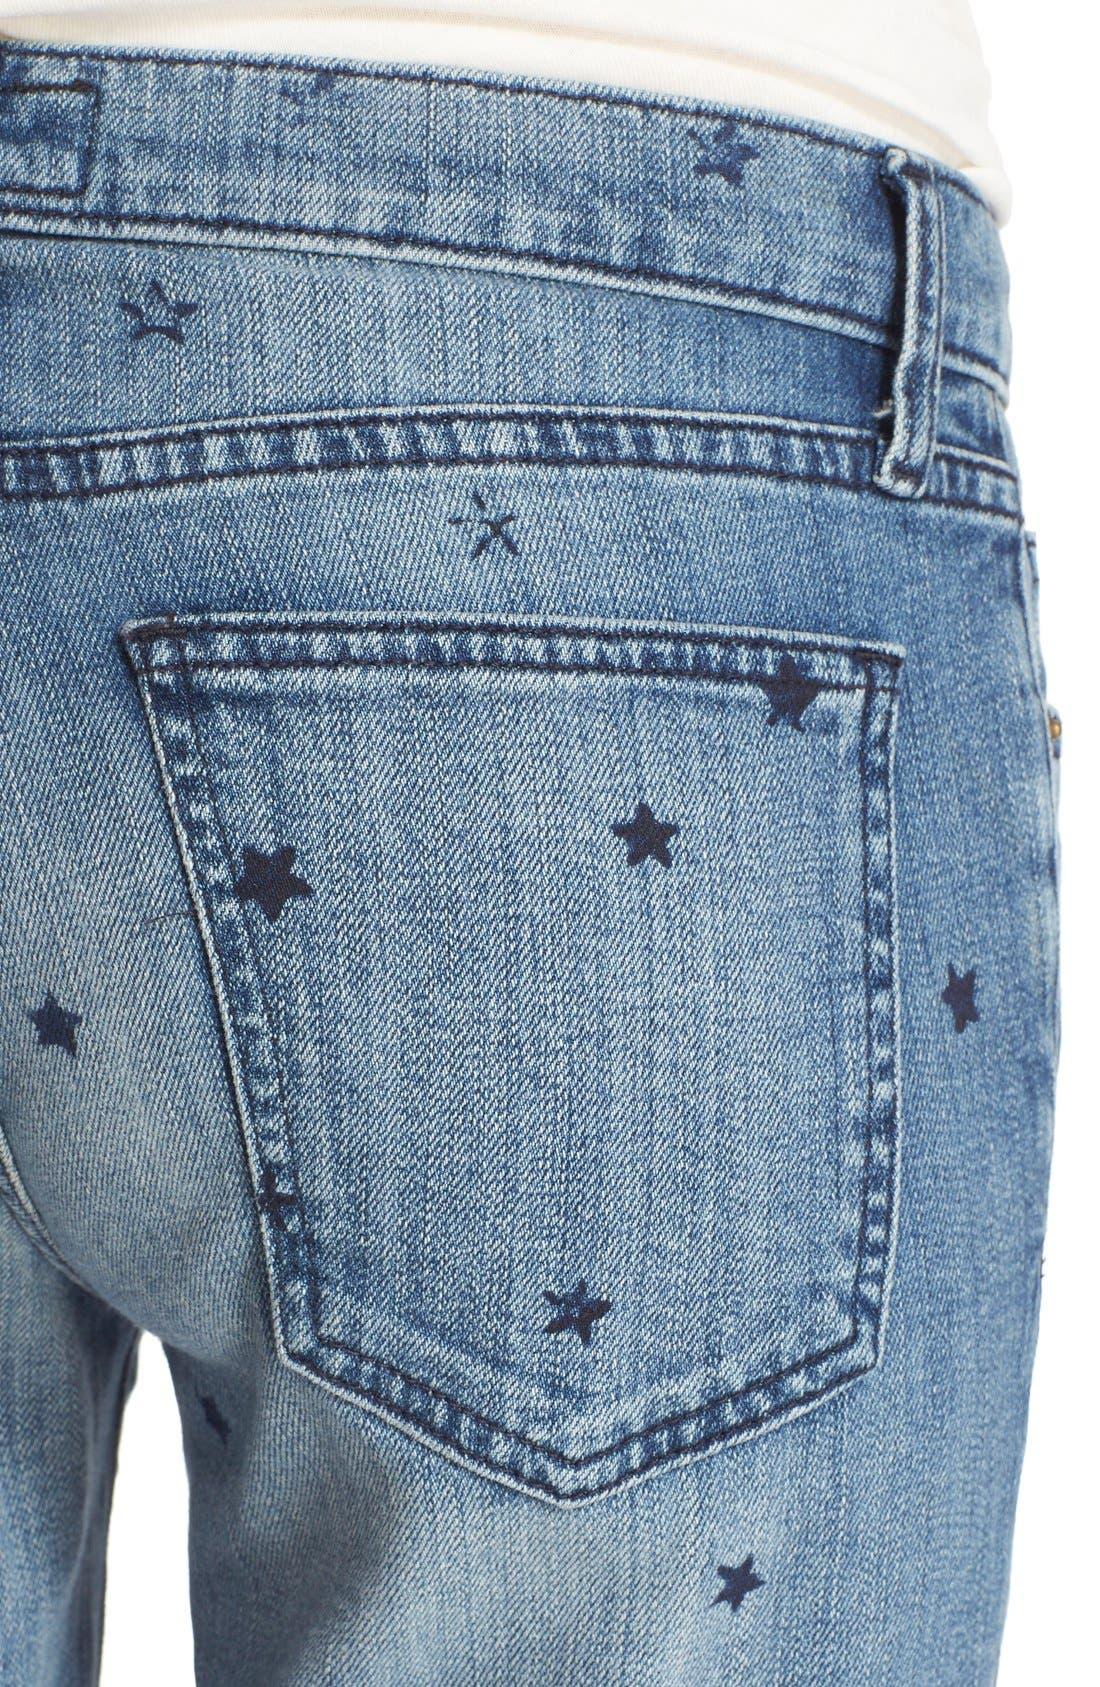 Alternate Image 4  - Current/Elliott 'The Stiletto' Star Print Skinny Jeans (Revival with Mini Navy Stars)